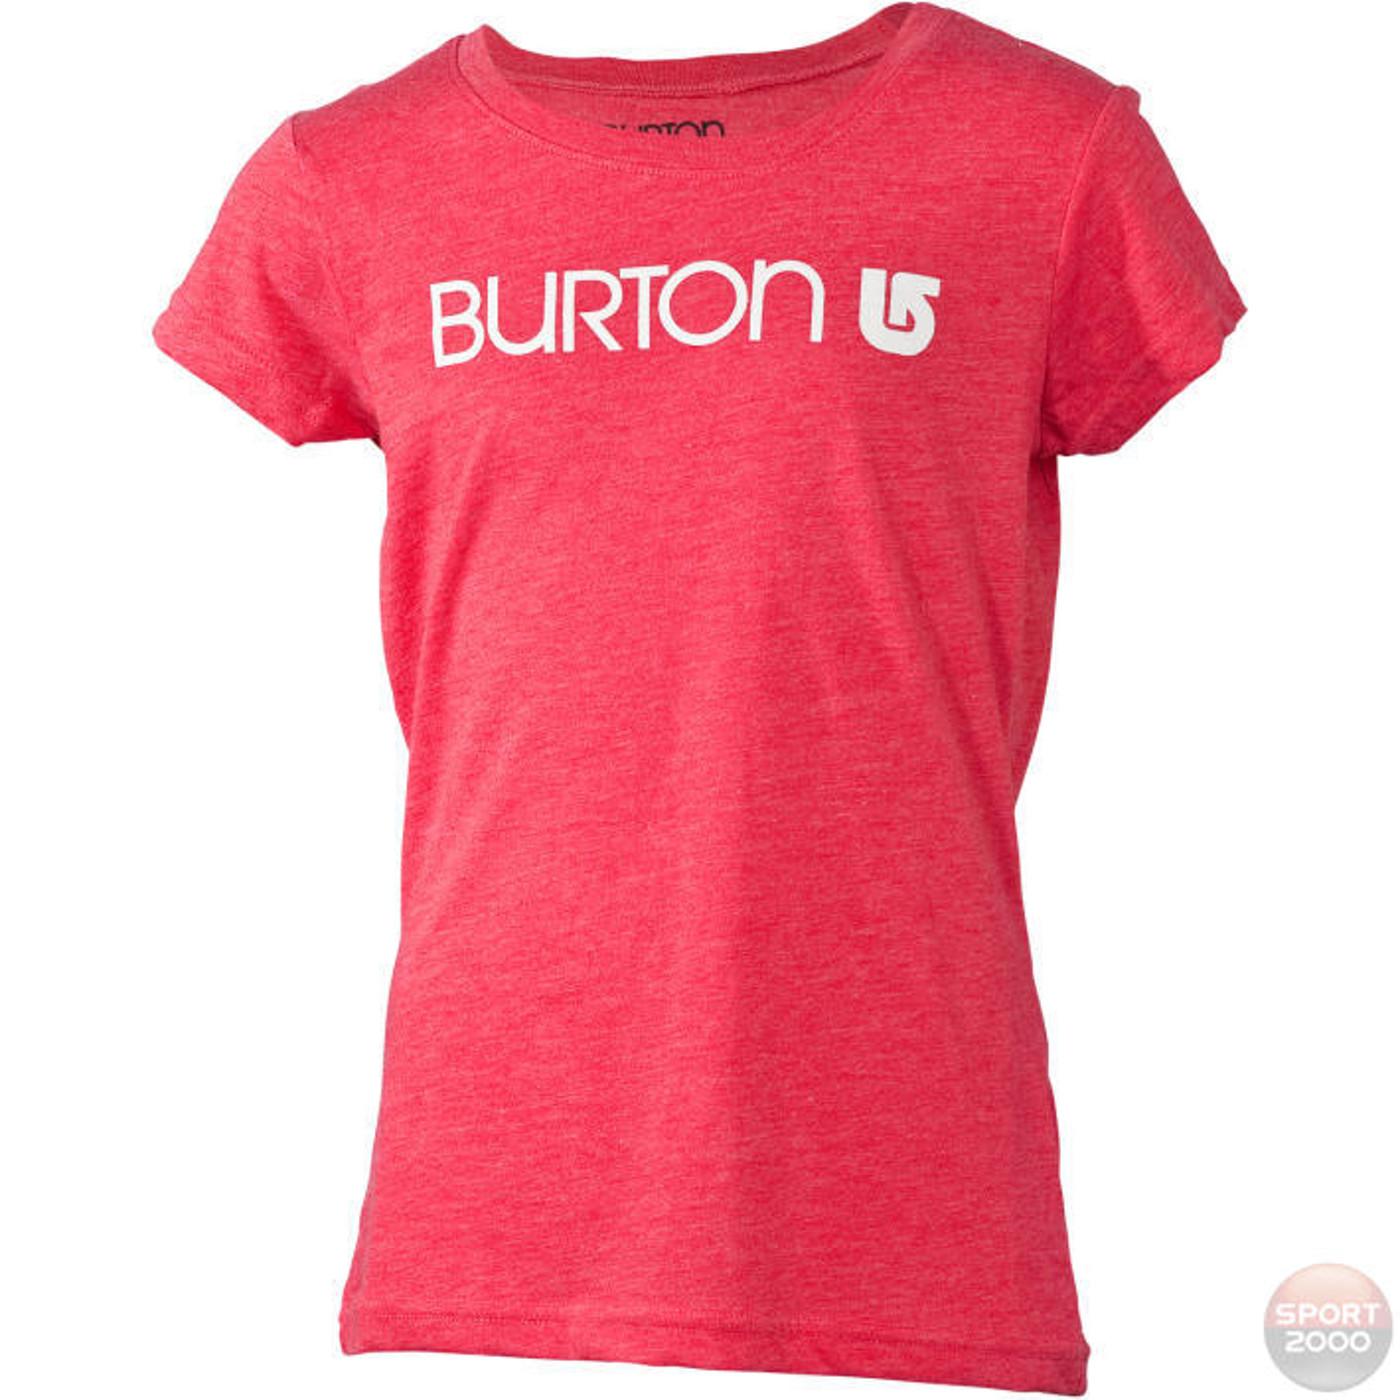 BURTON Shirt HER LOGO Md. - Kinder